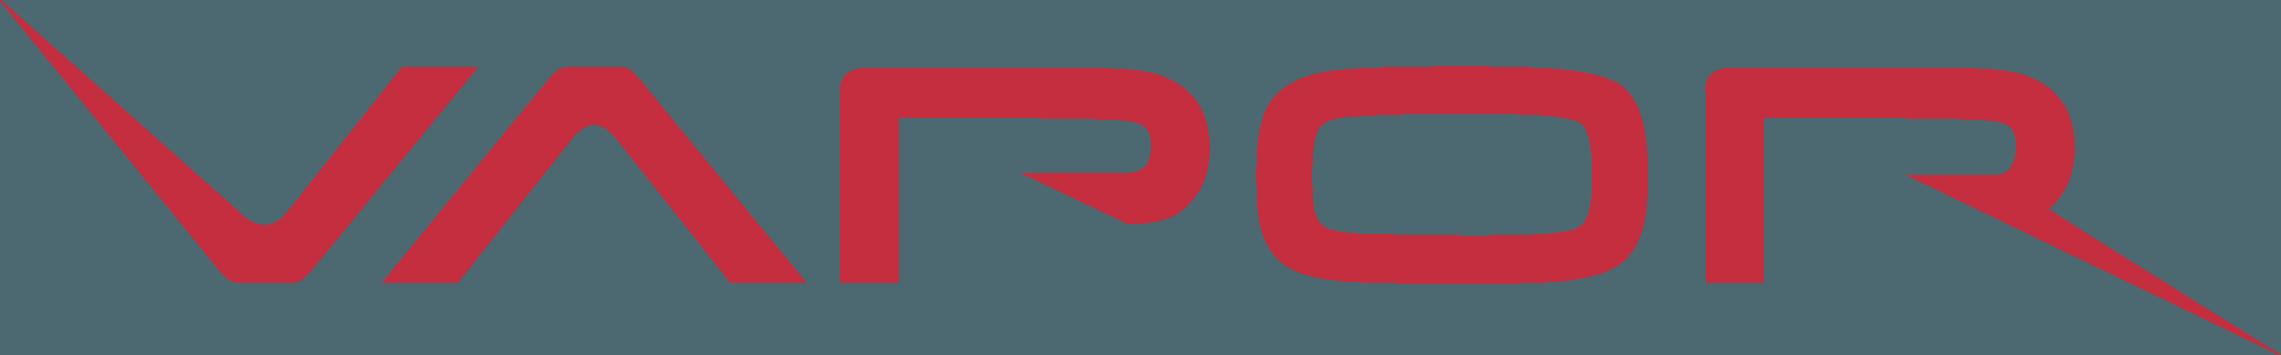 Vapor Logo png